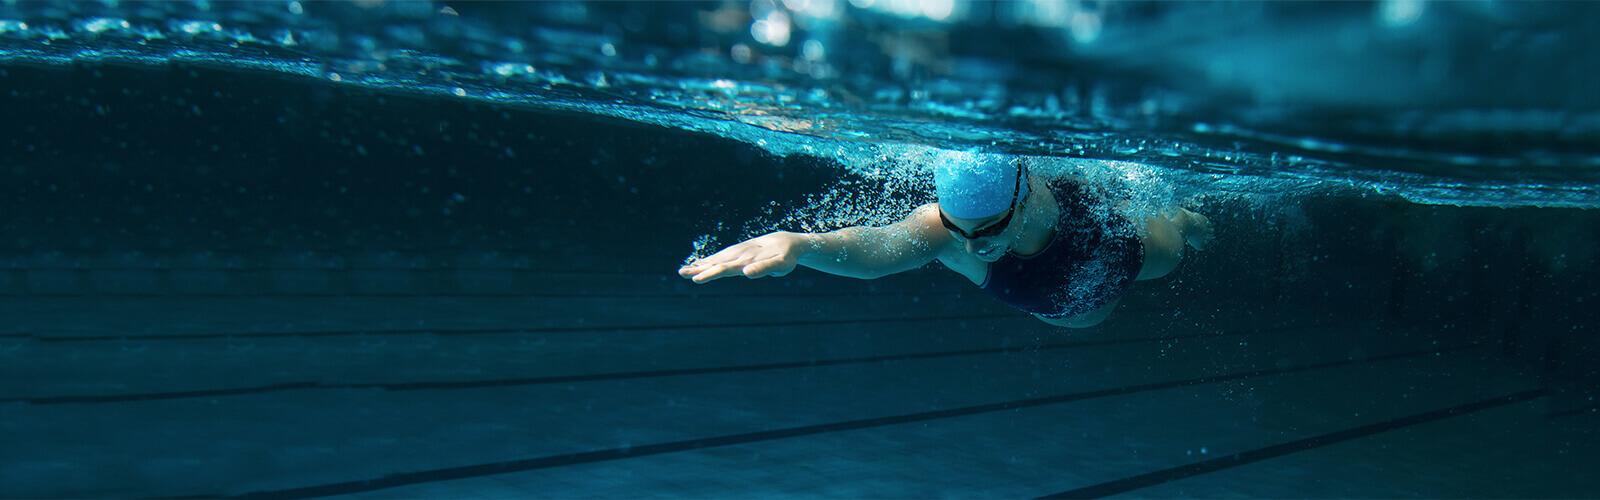 swimming fitness